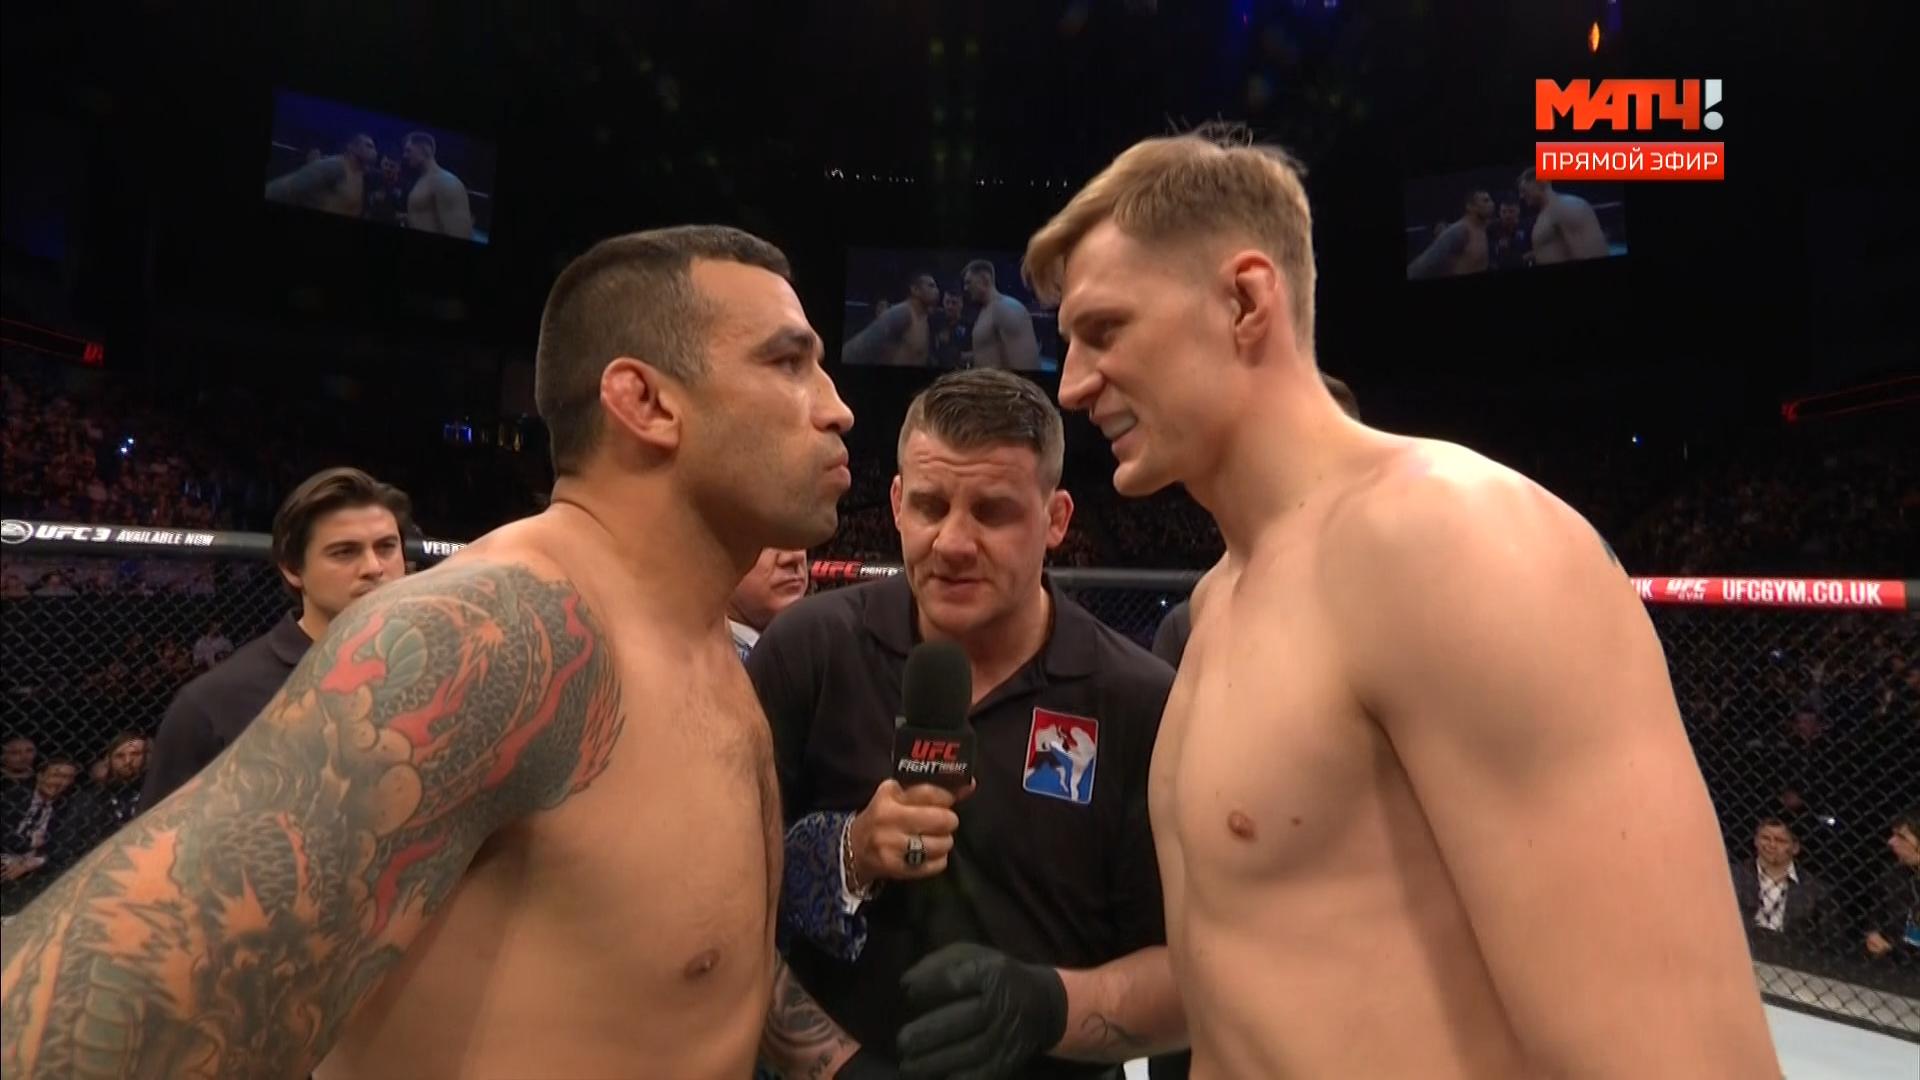 UFC Fight Night 127: Werdum vs. Volkov / Весь кард (2018/HDTV/WEB-DL) 1080/720р, МАТЧ ТВ